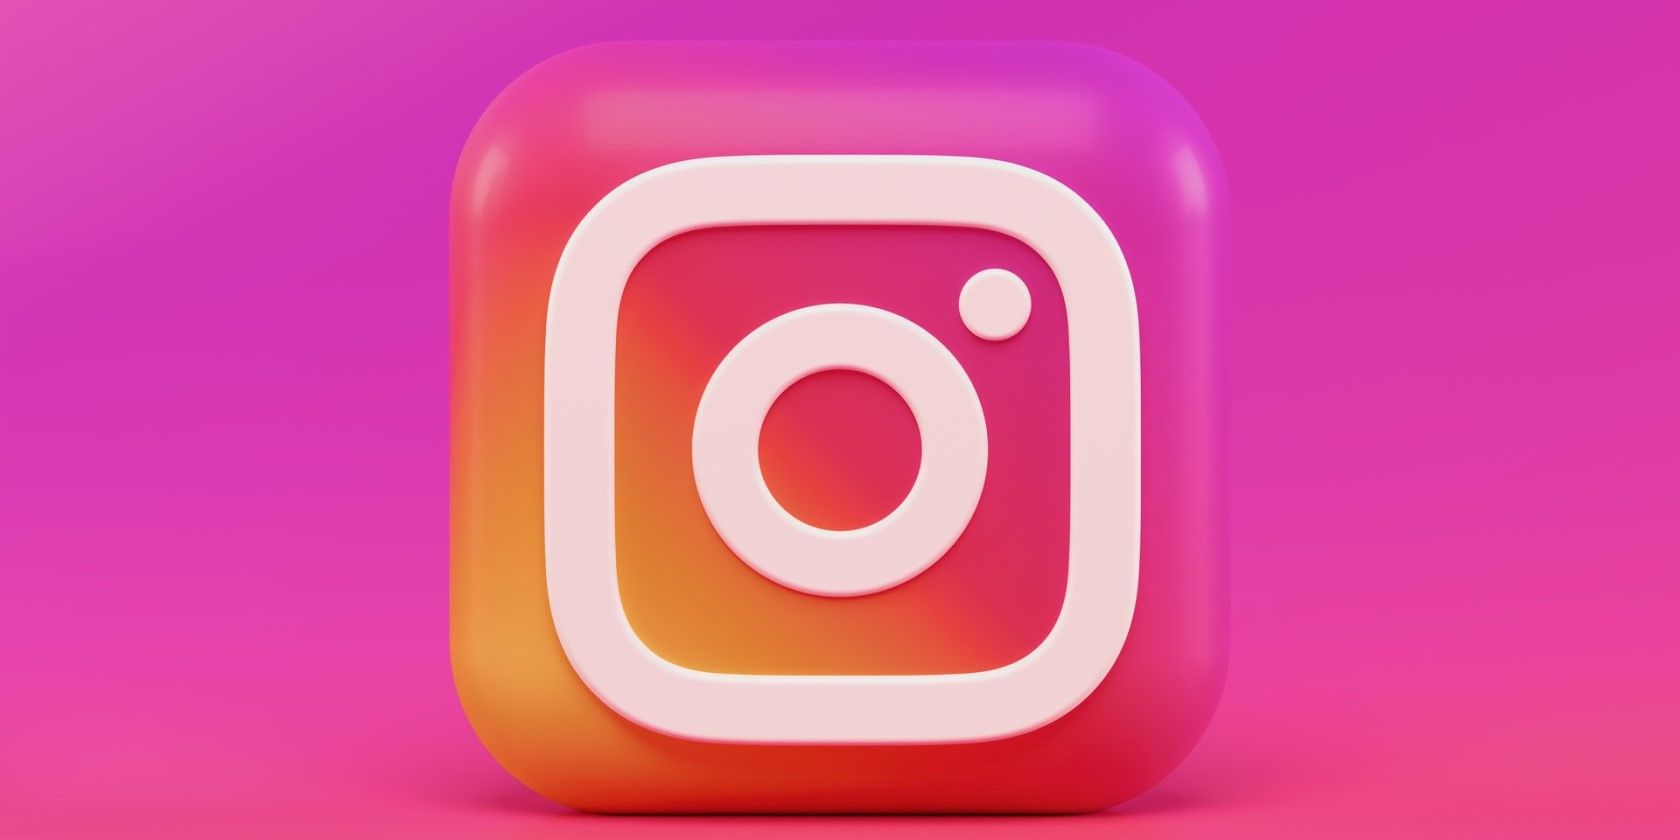 Facebook Is Developing an Instagram for Kids Under 13